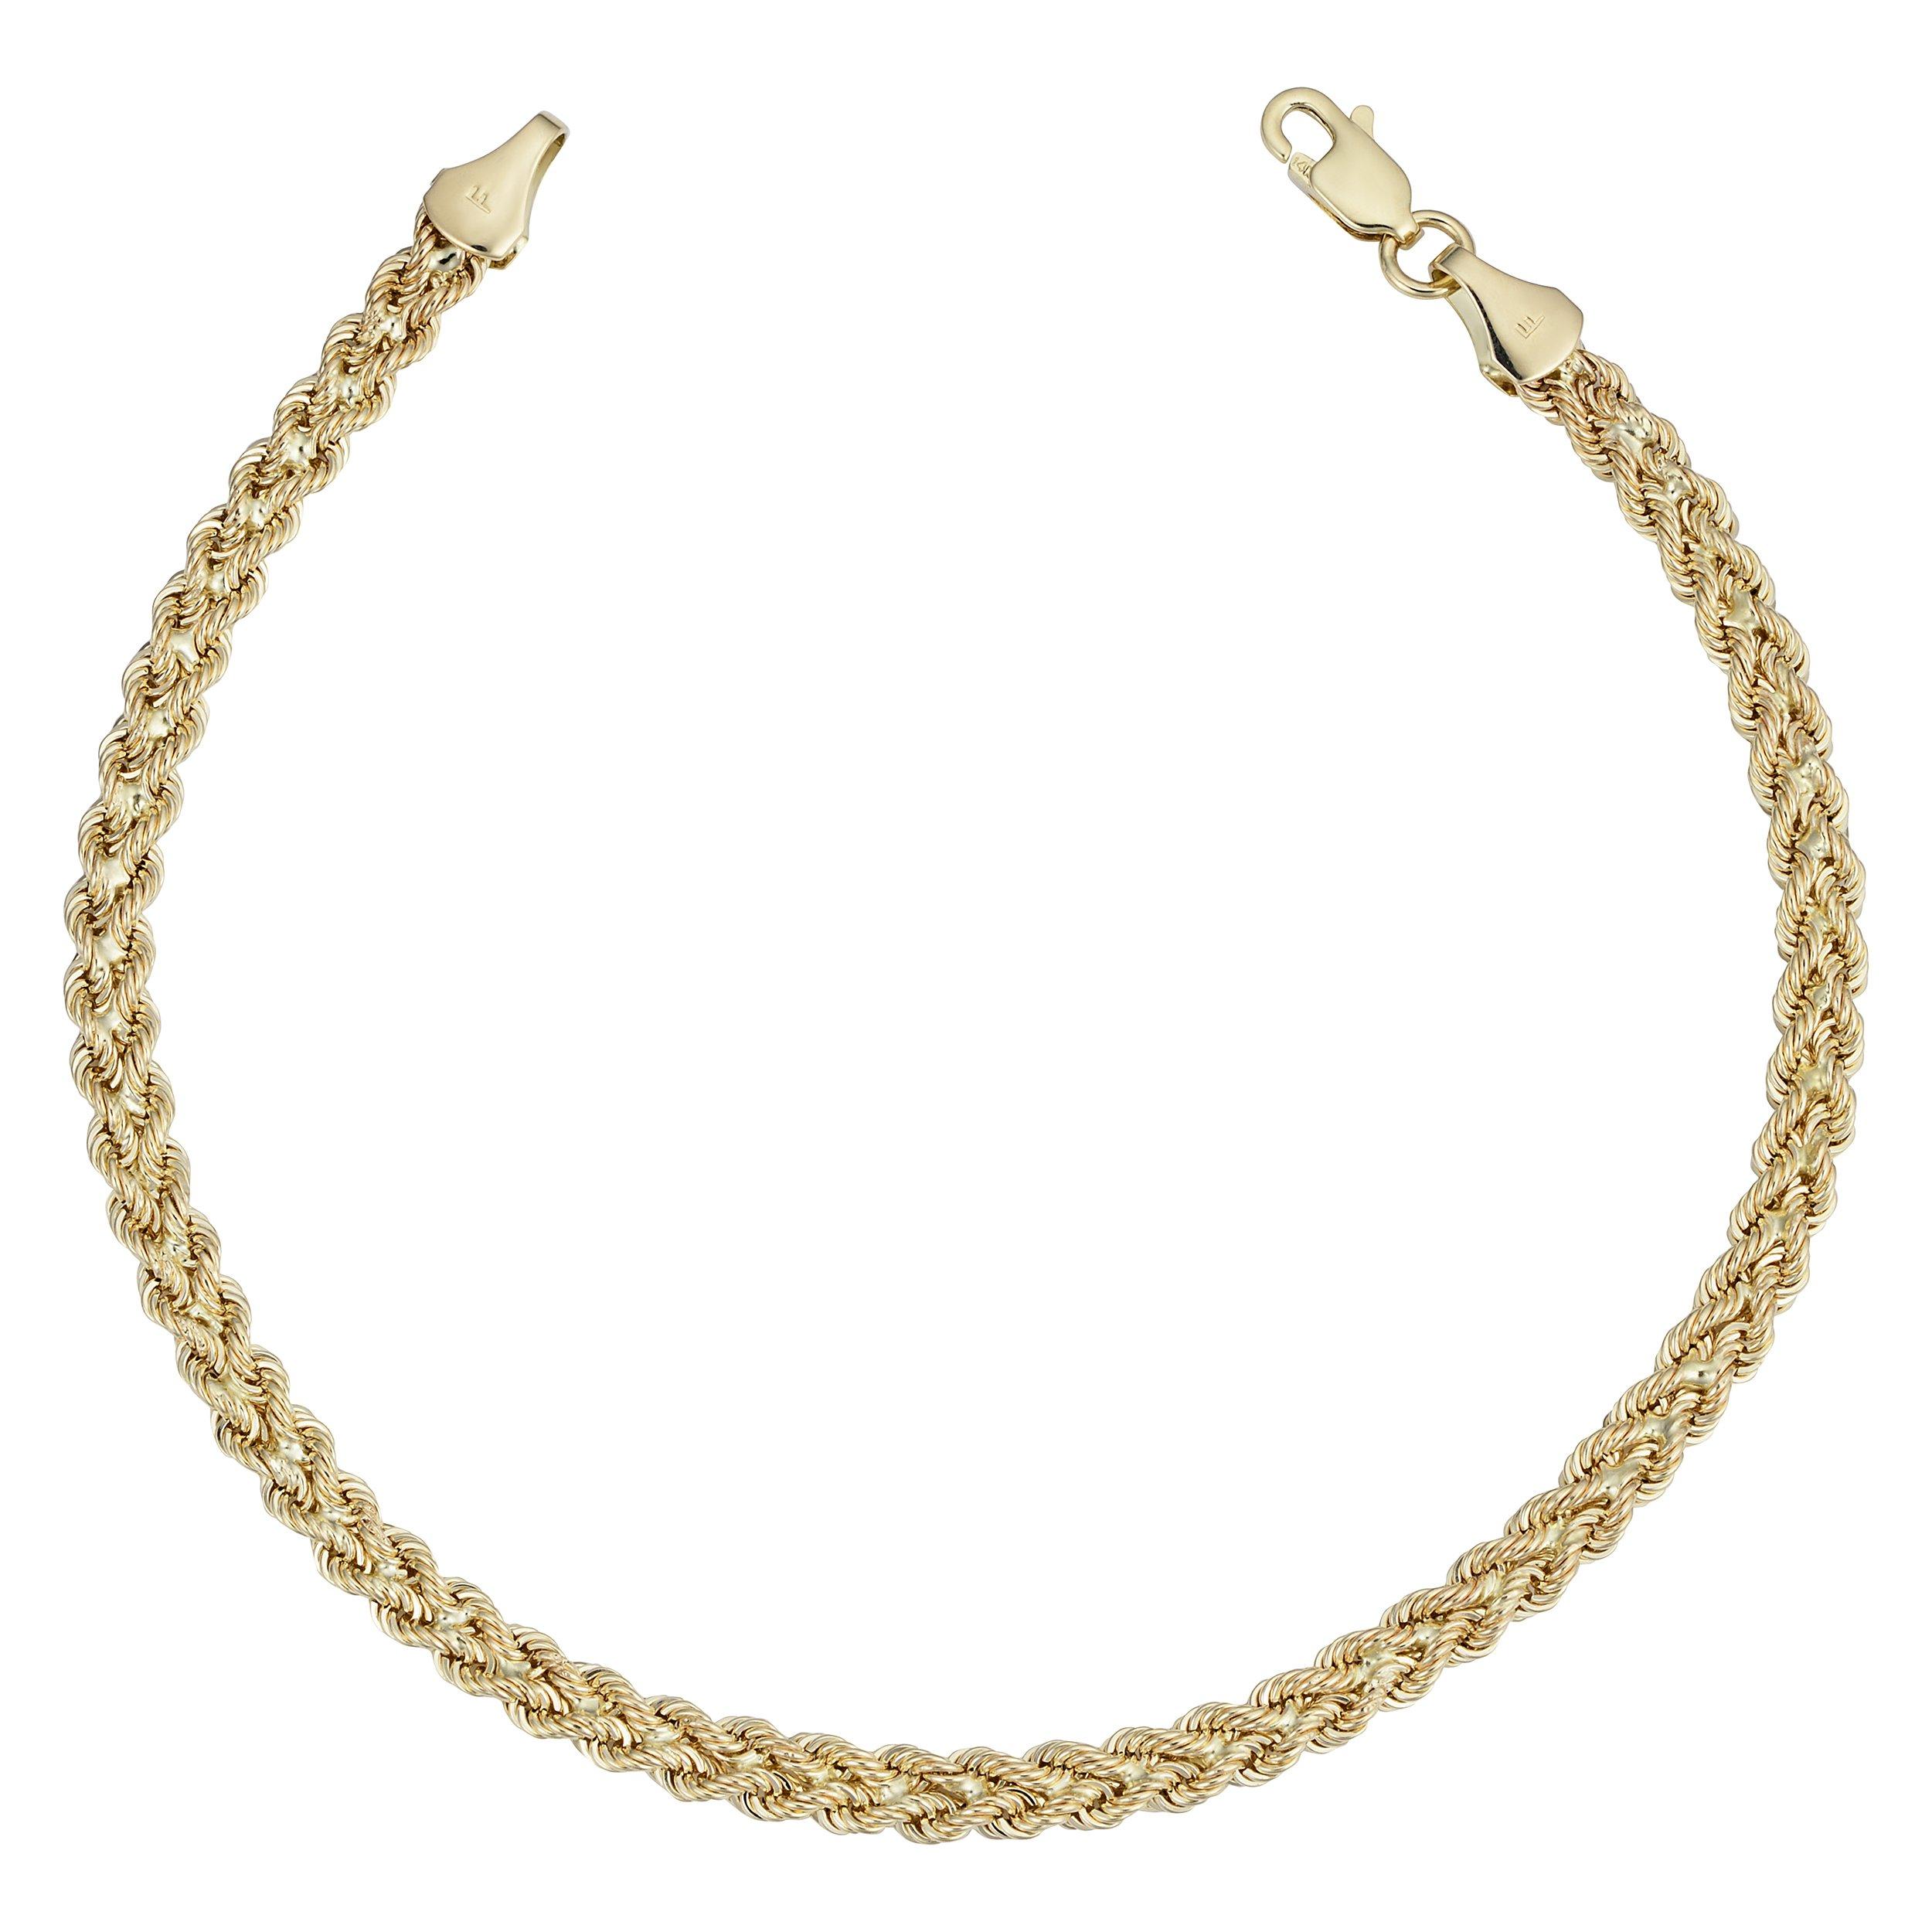 Kooljewelry 14k Yellow Gold Braided Rope Bracelet (3.8 mm, 7.5 inch)